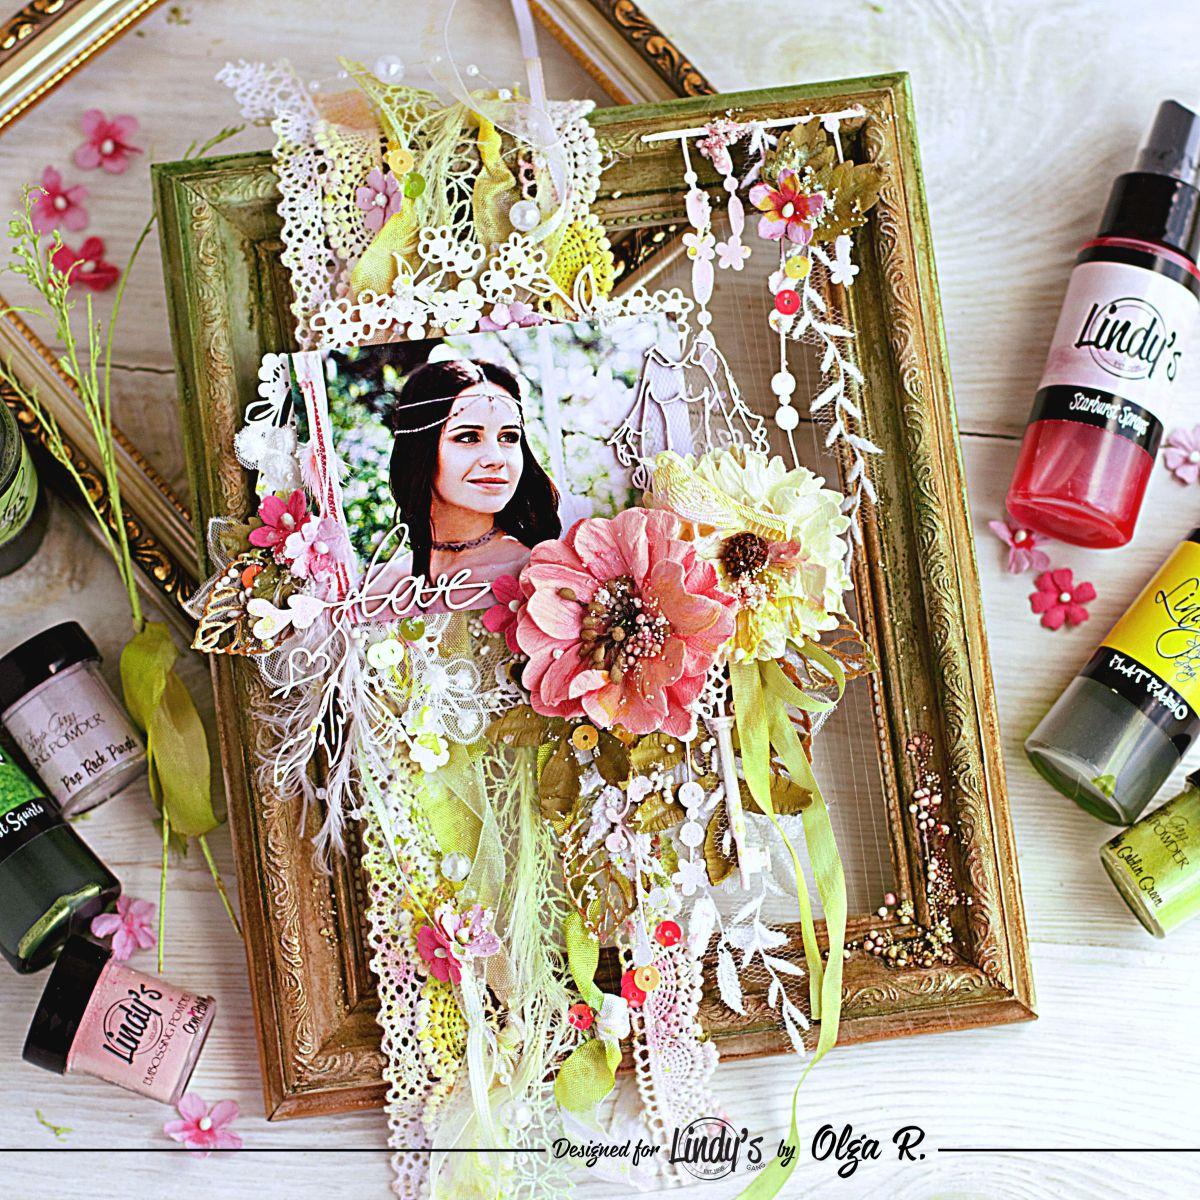 Boho Style Frame with Olga Ravenskaya